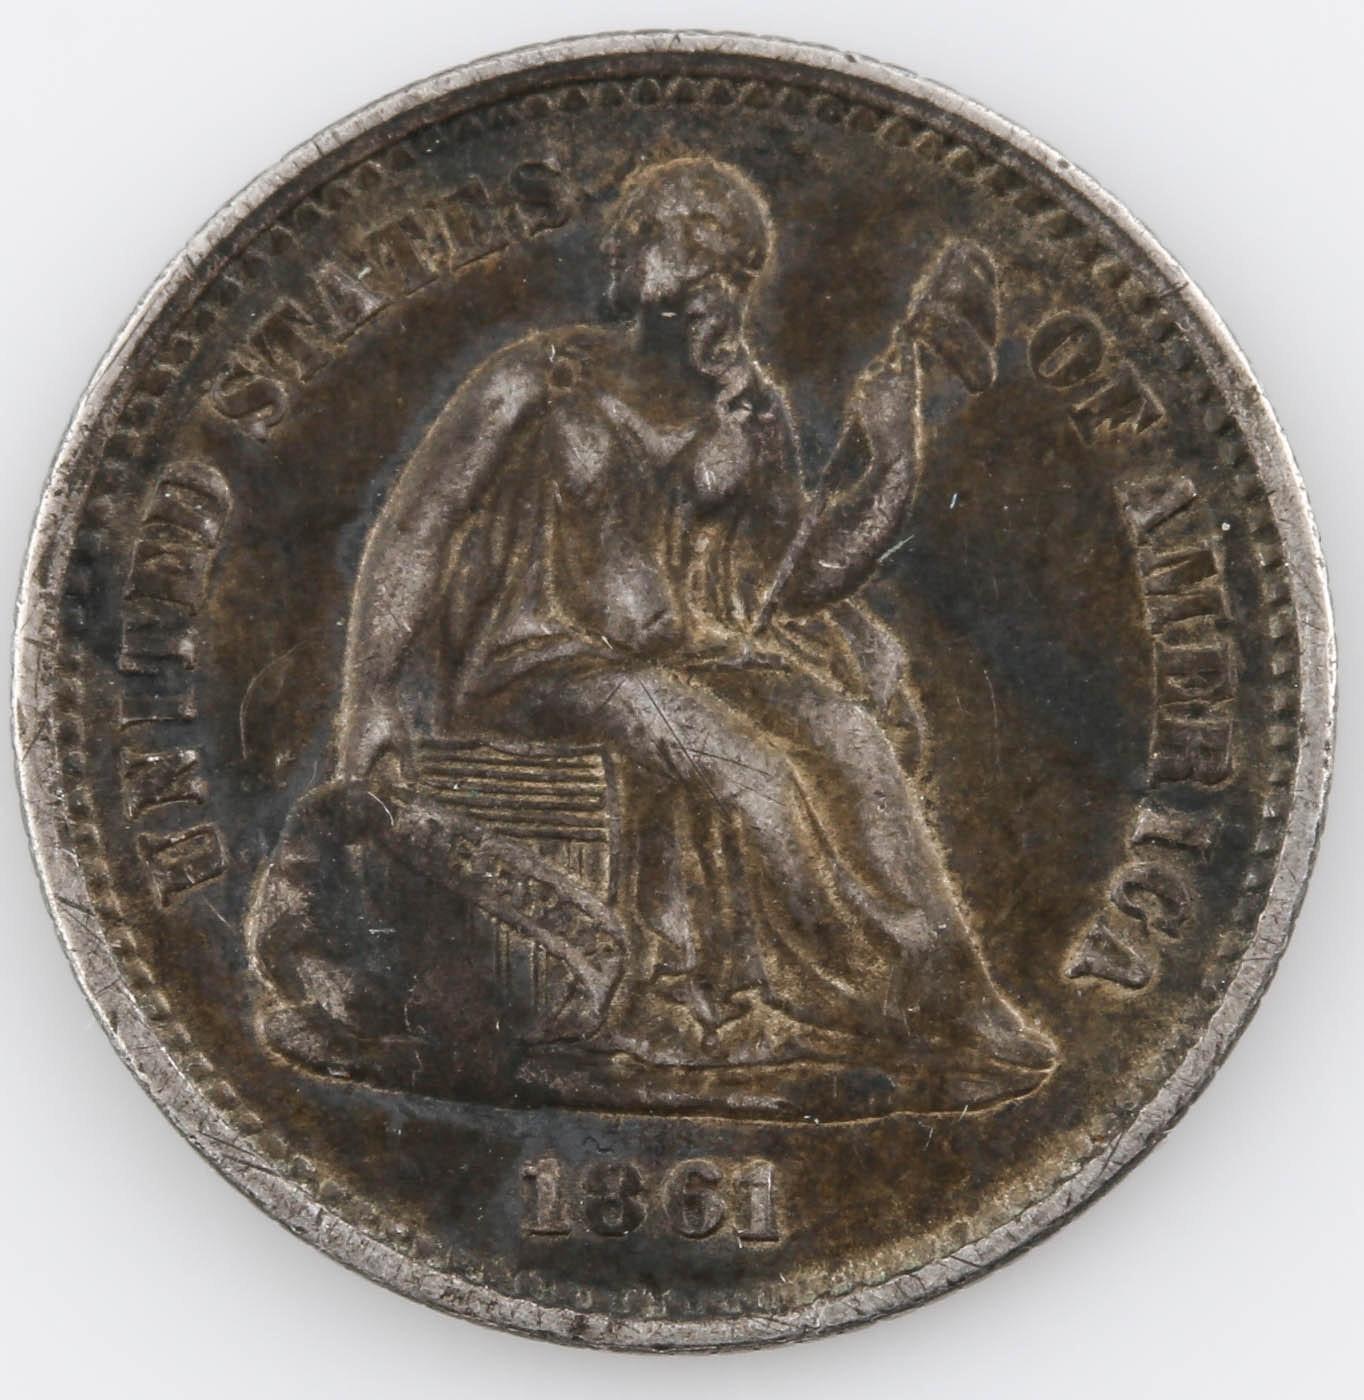 1861 Seated Liberty Silver Half Dime